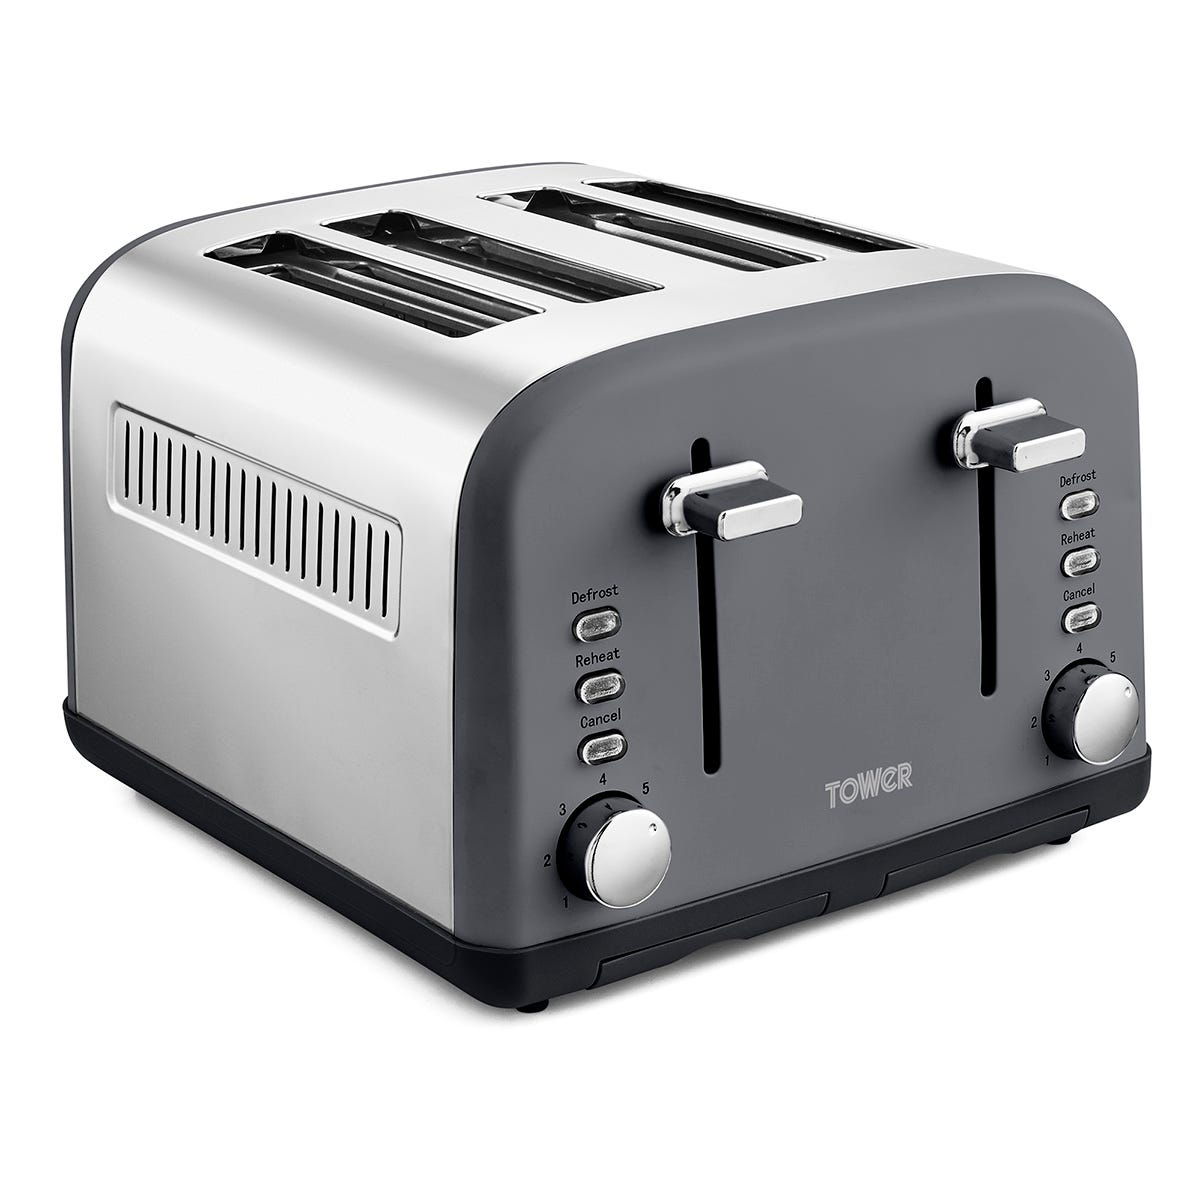 Tower T20042SLT Infinity Stone 4 Slice Toaster - Grey